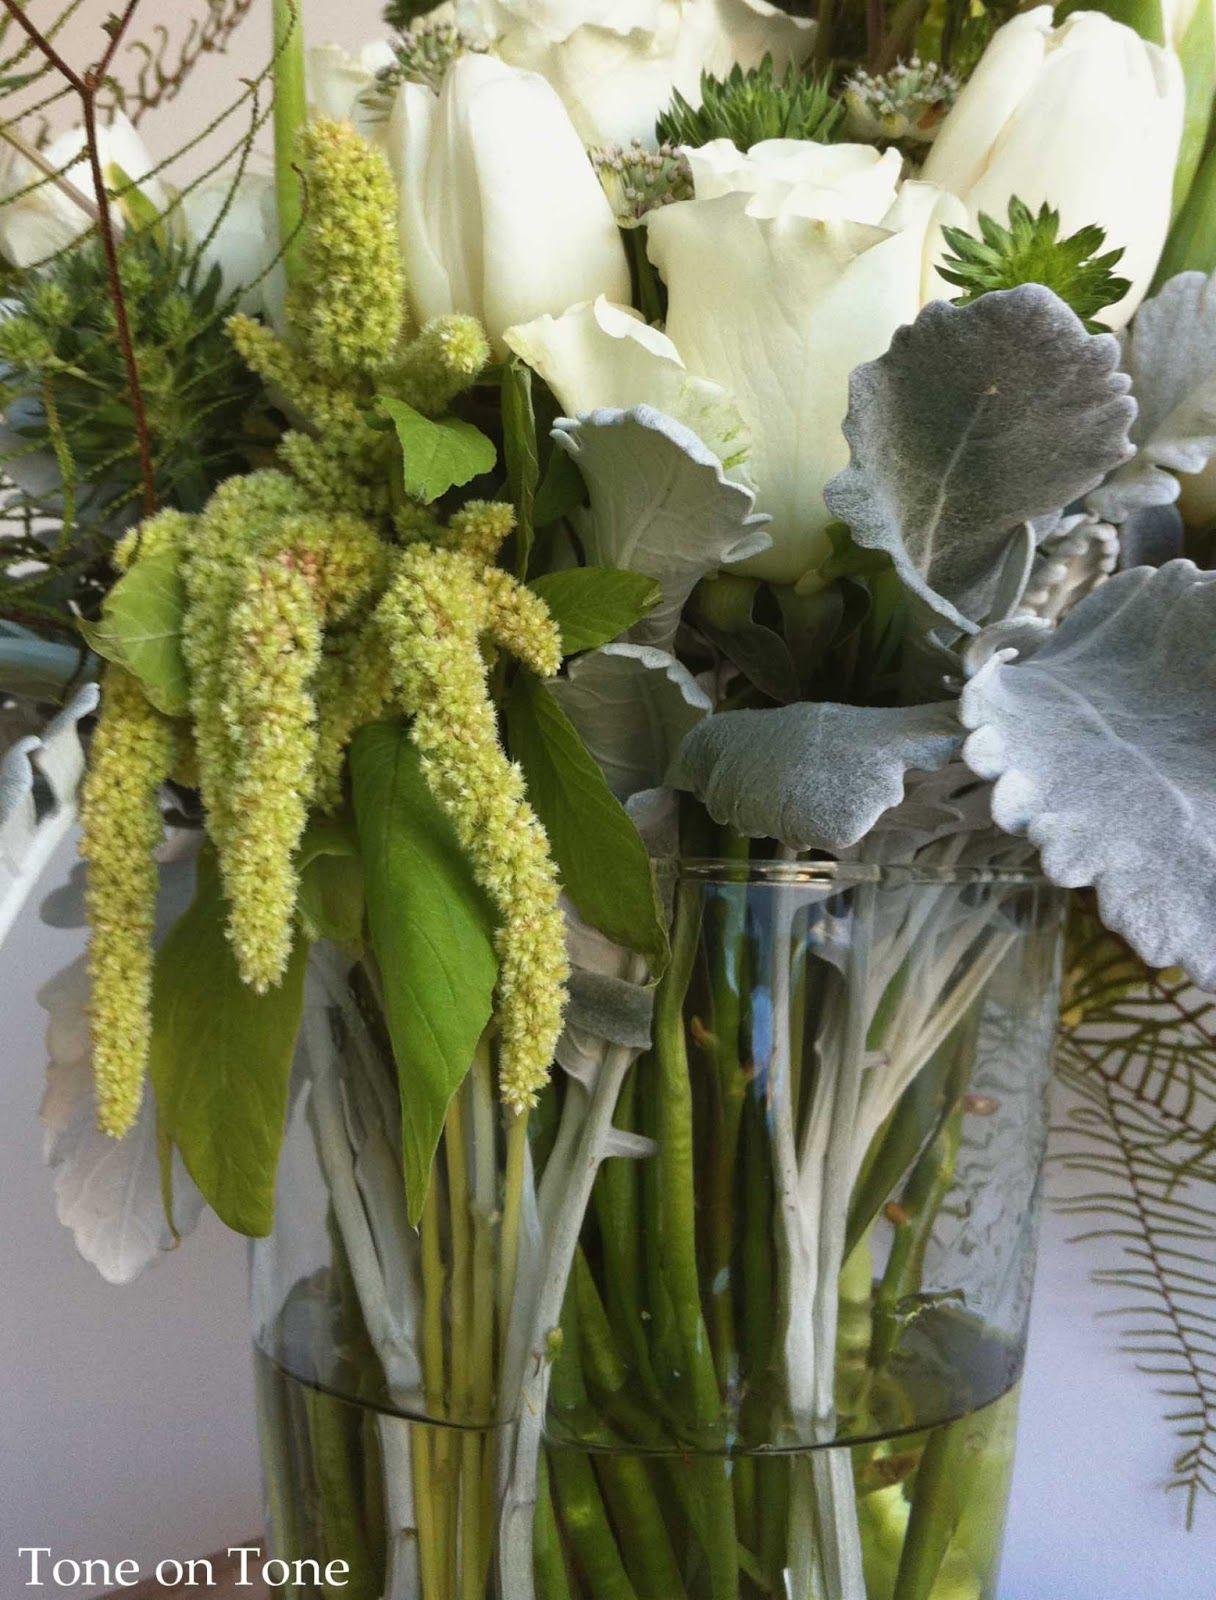 Tone on tone february flowers flowers pinterest flowers tone on tone february flowers izmirmasajfo